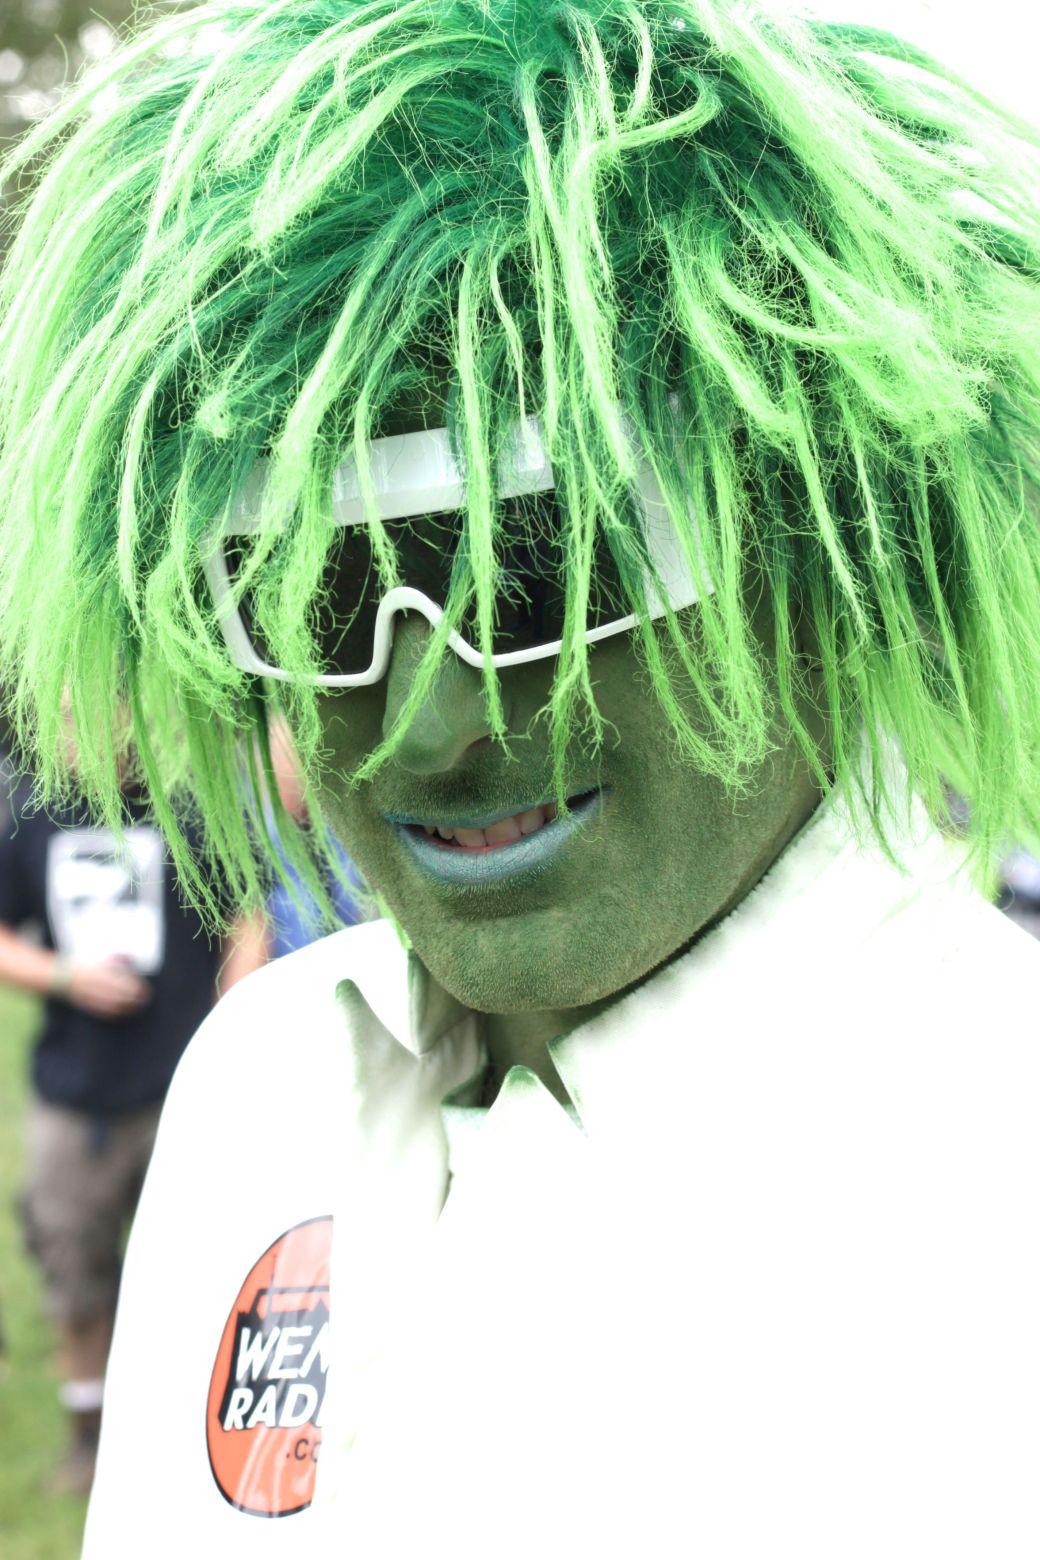 boston hemp fest 2014 park street people green man 2